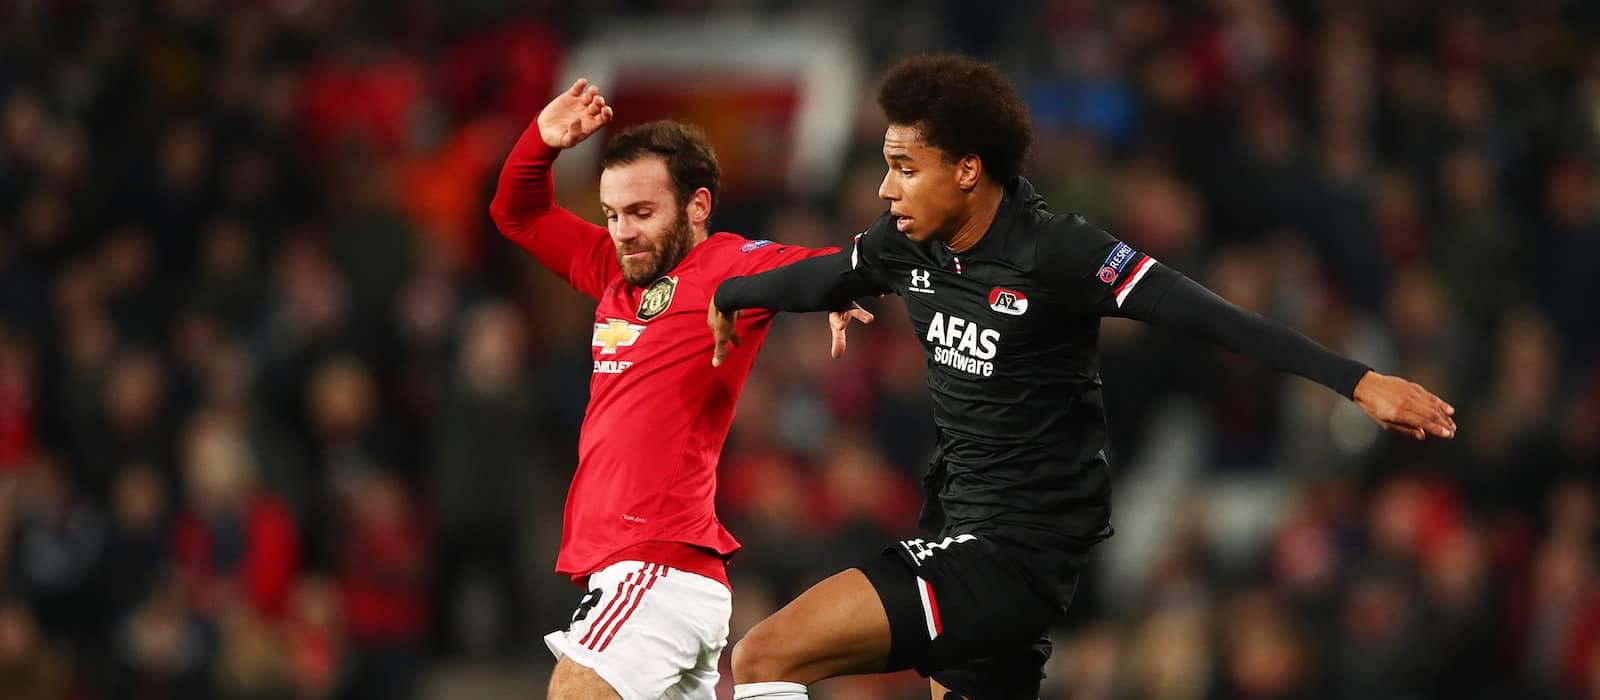 Juan Mata silences critics with fine performance vs AZ Alkmaar